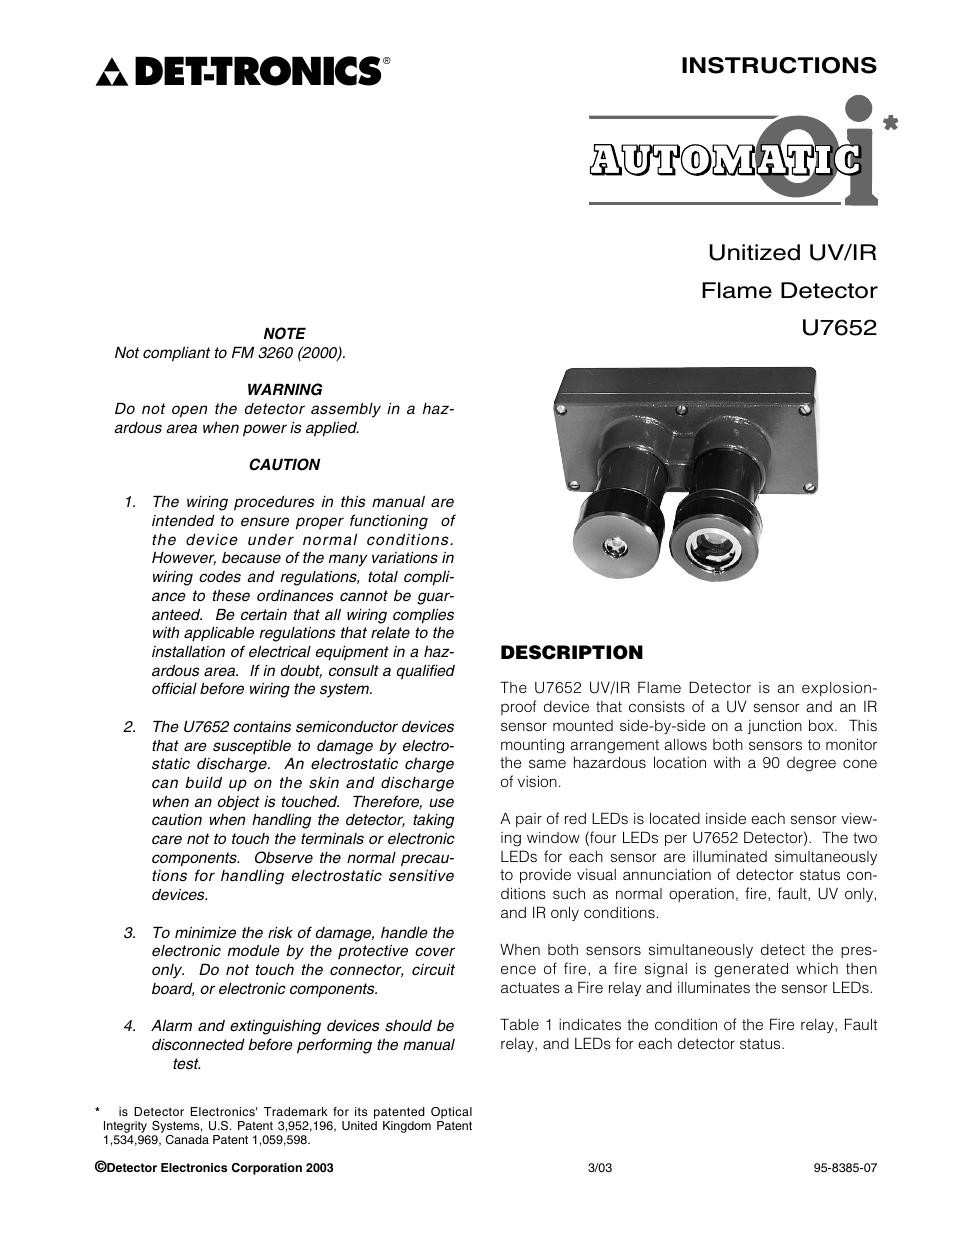 hight resolution of tronics instructions unitized uv ir flame detector u7652 det tronics u7652b c unitized uv ir flame detector user manual page 3 22